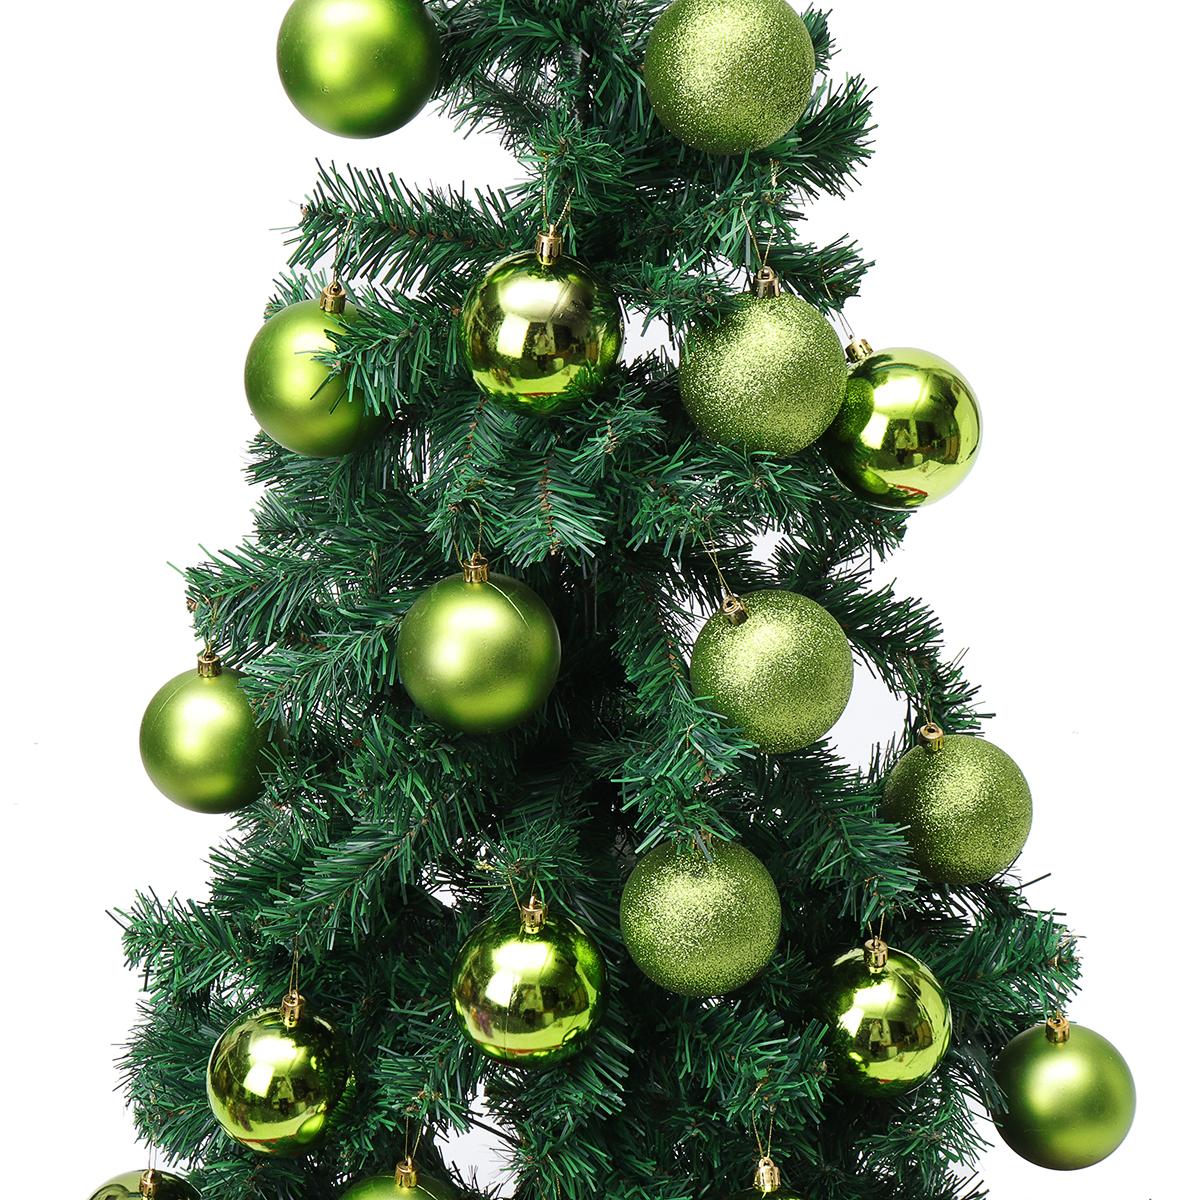 6//12Pcs Christmas Snowball Balls 40-100mm Party Ornaments Bauble Xmas Tree Decor